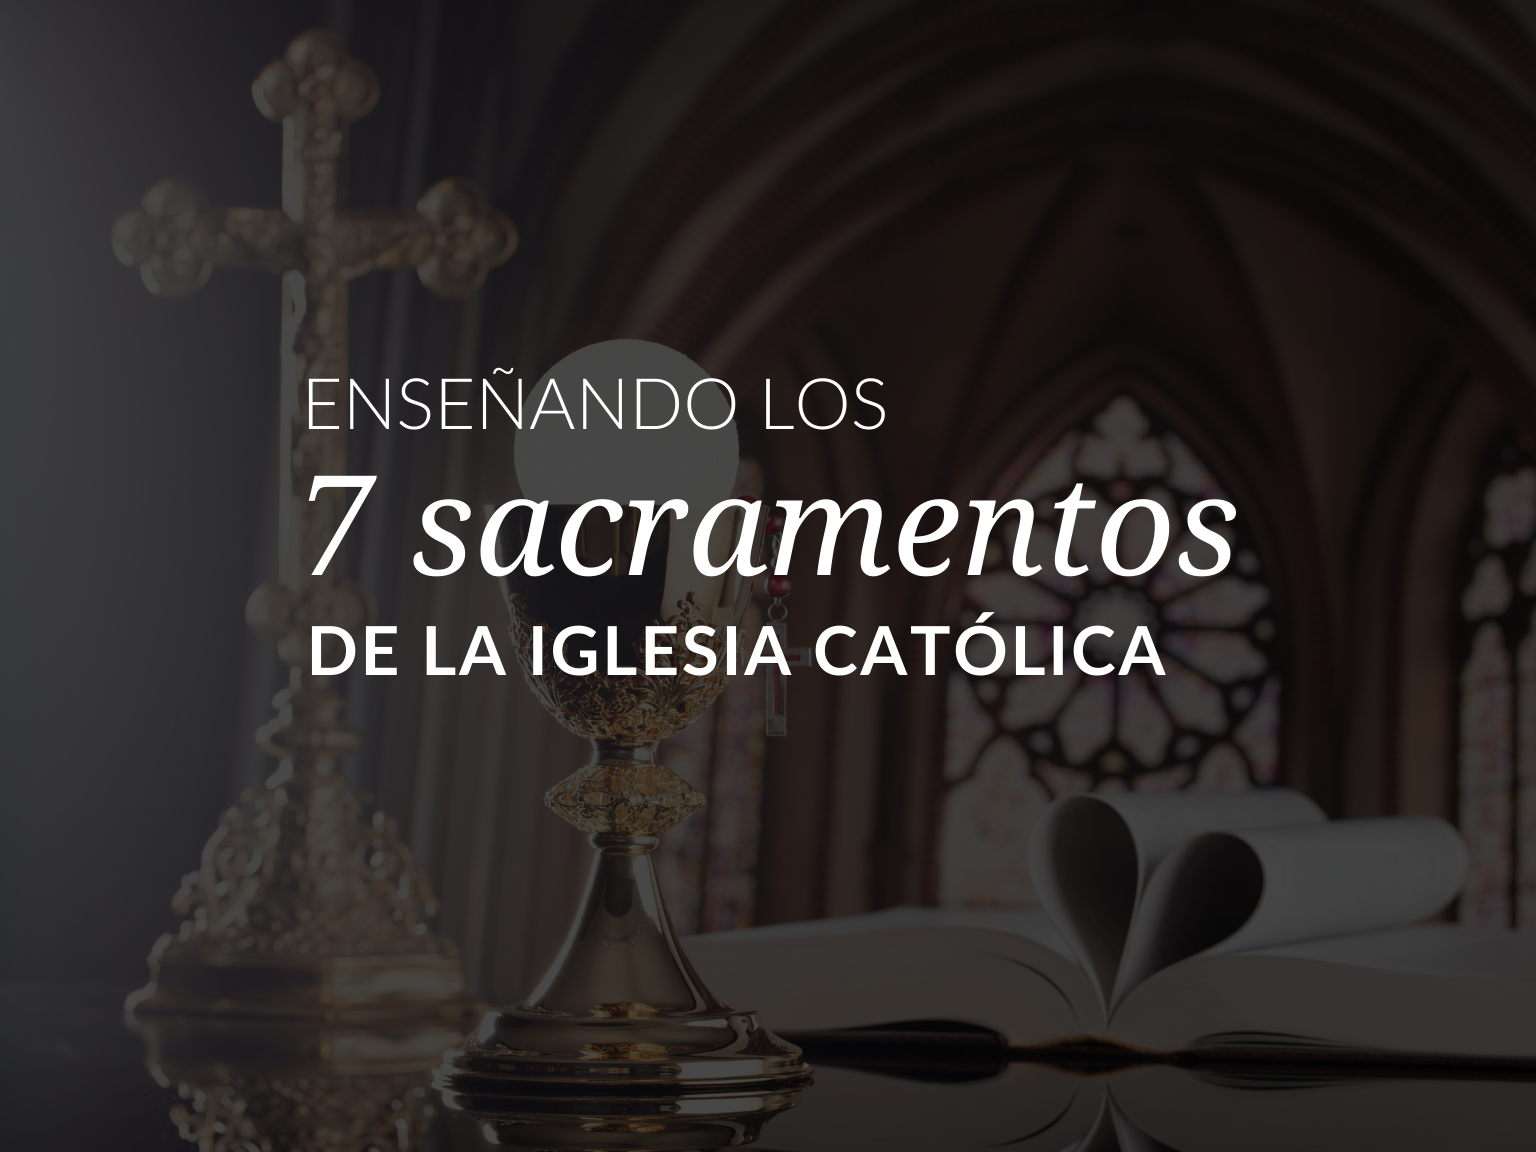 los-7-sacramentos-de-la-iglesia-catolica